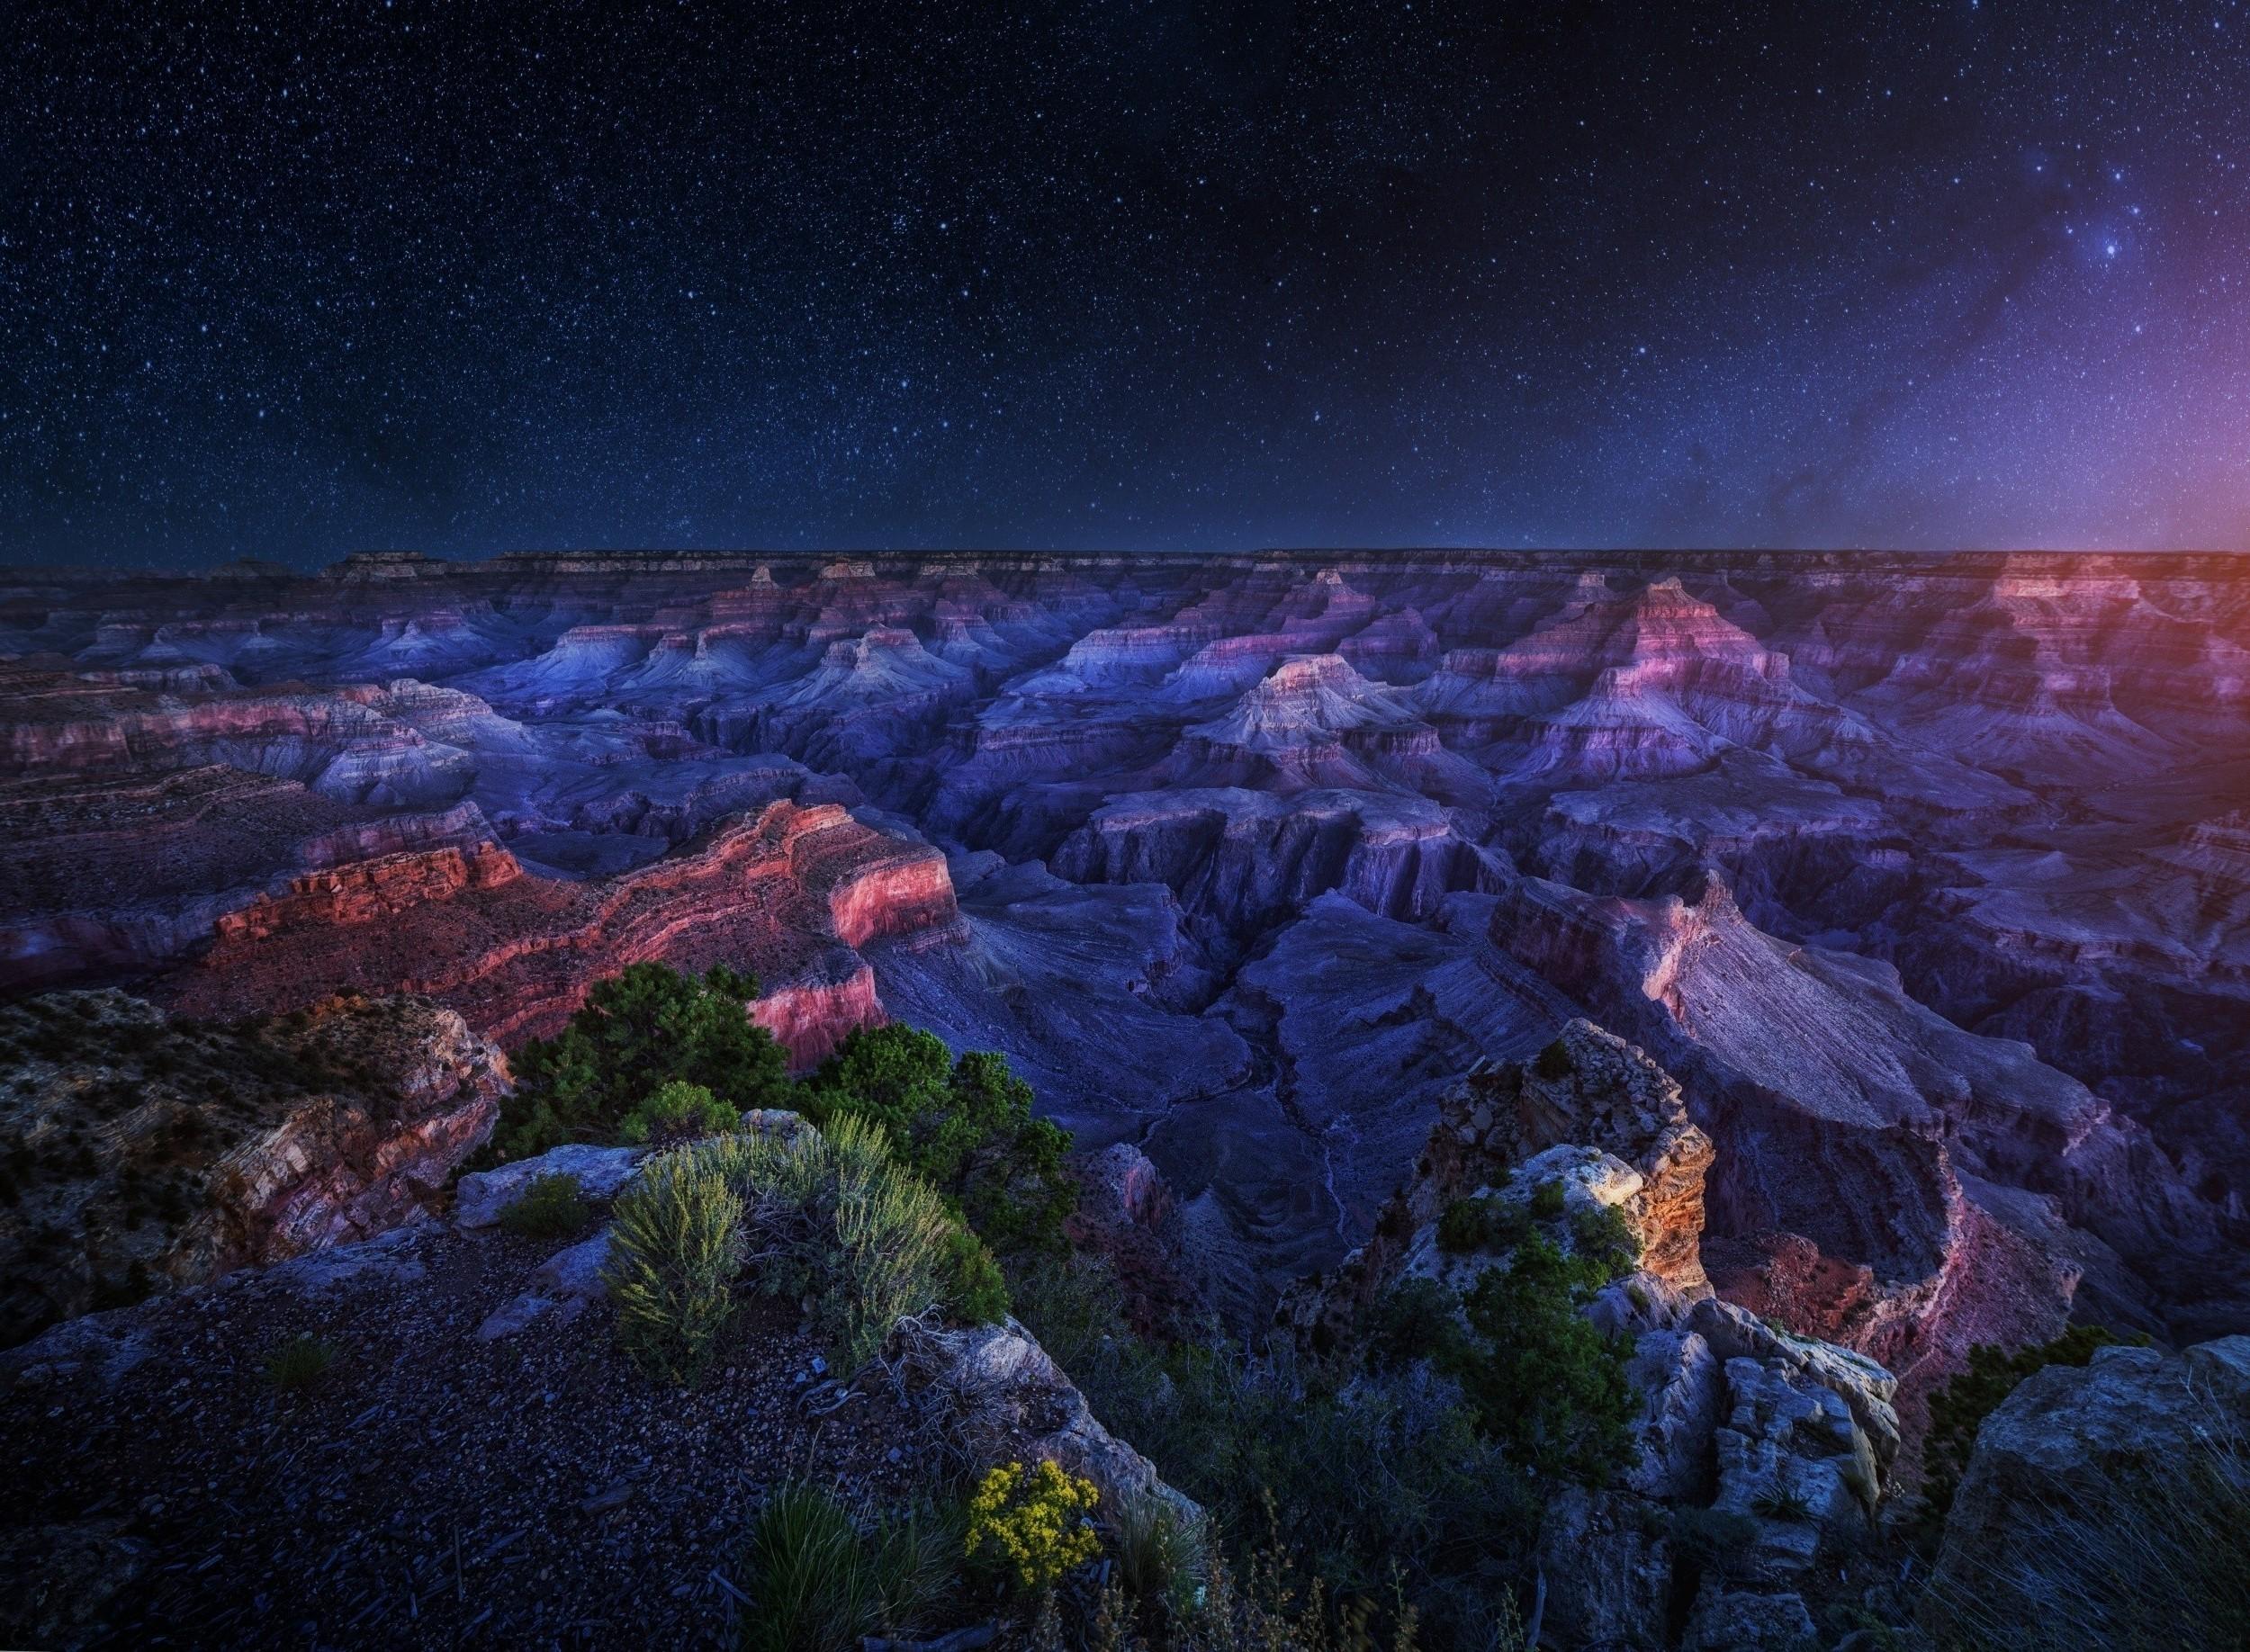 Starry Night Desktop Background (67+ Images